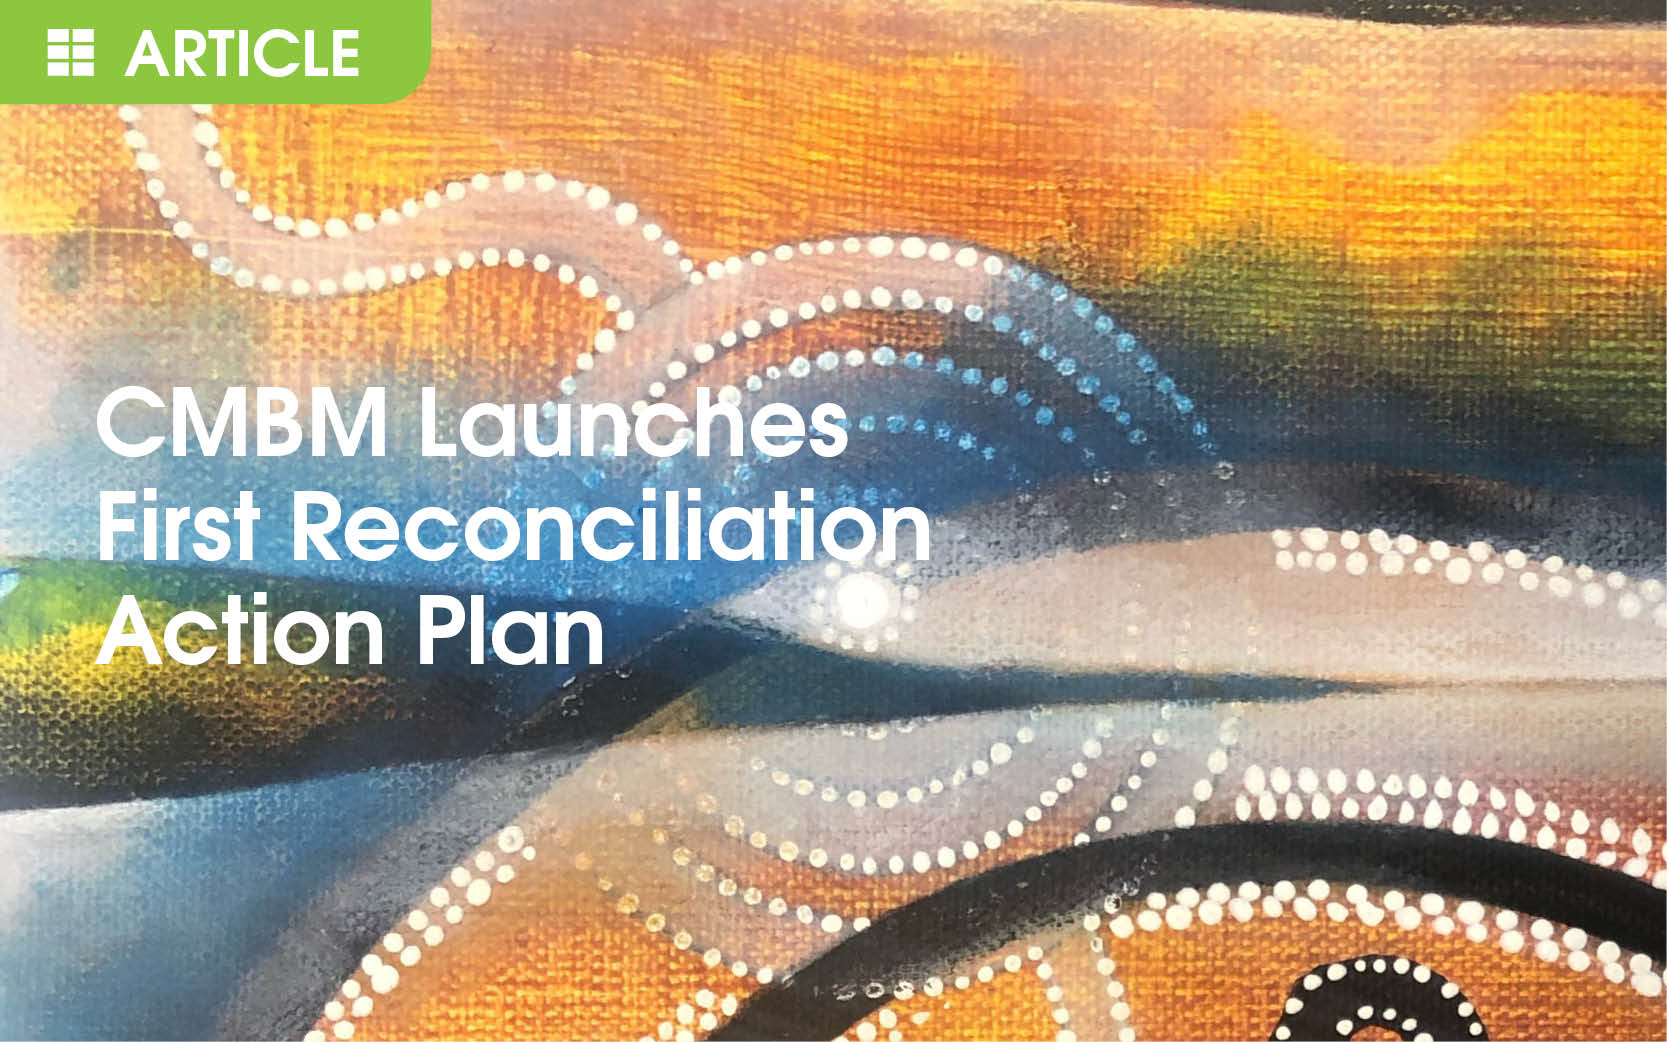 CMBM launches Reconciliation Action Plan for 2020